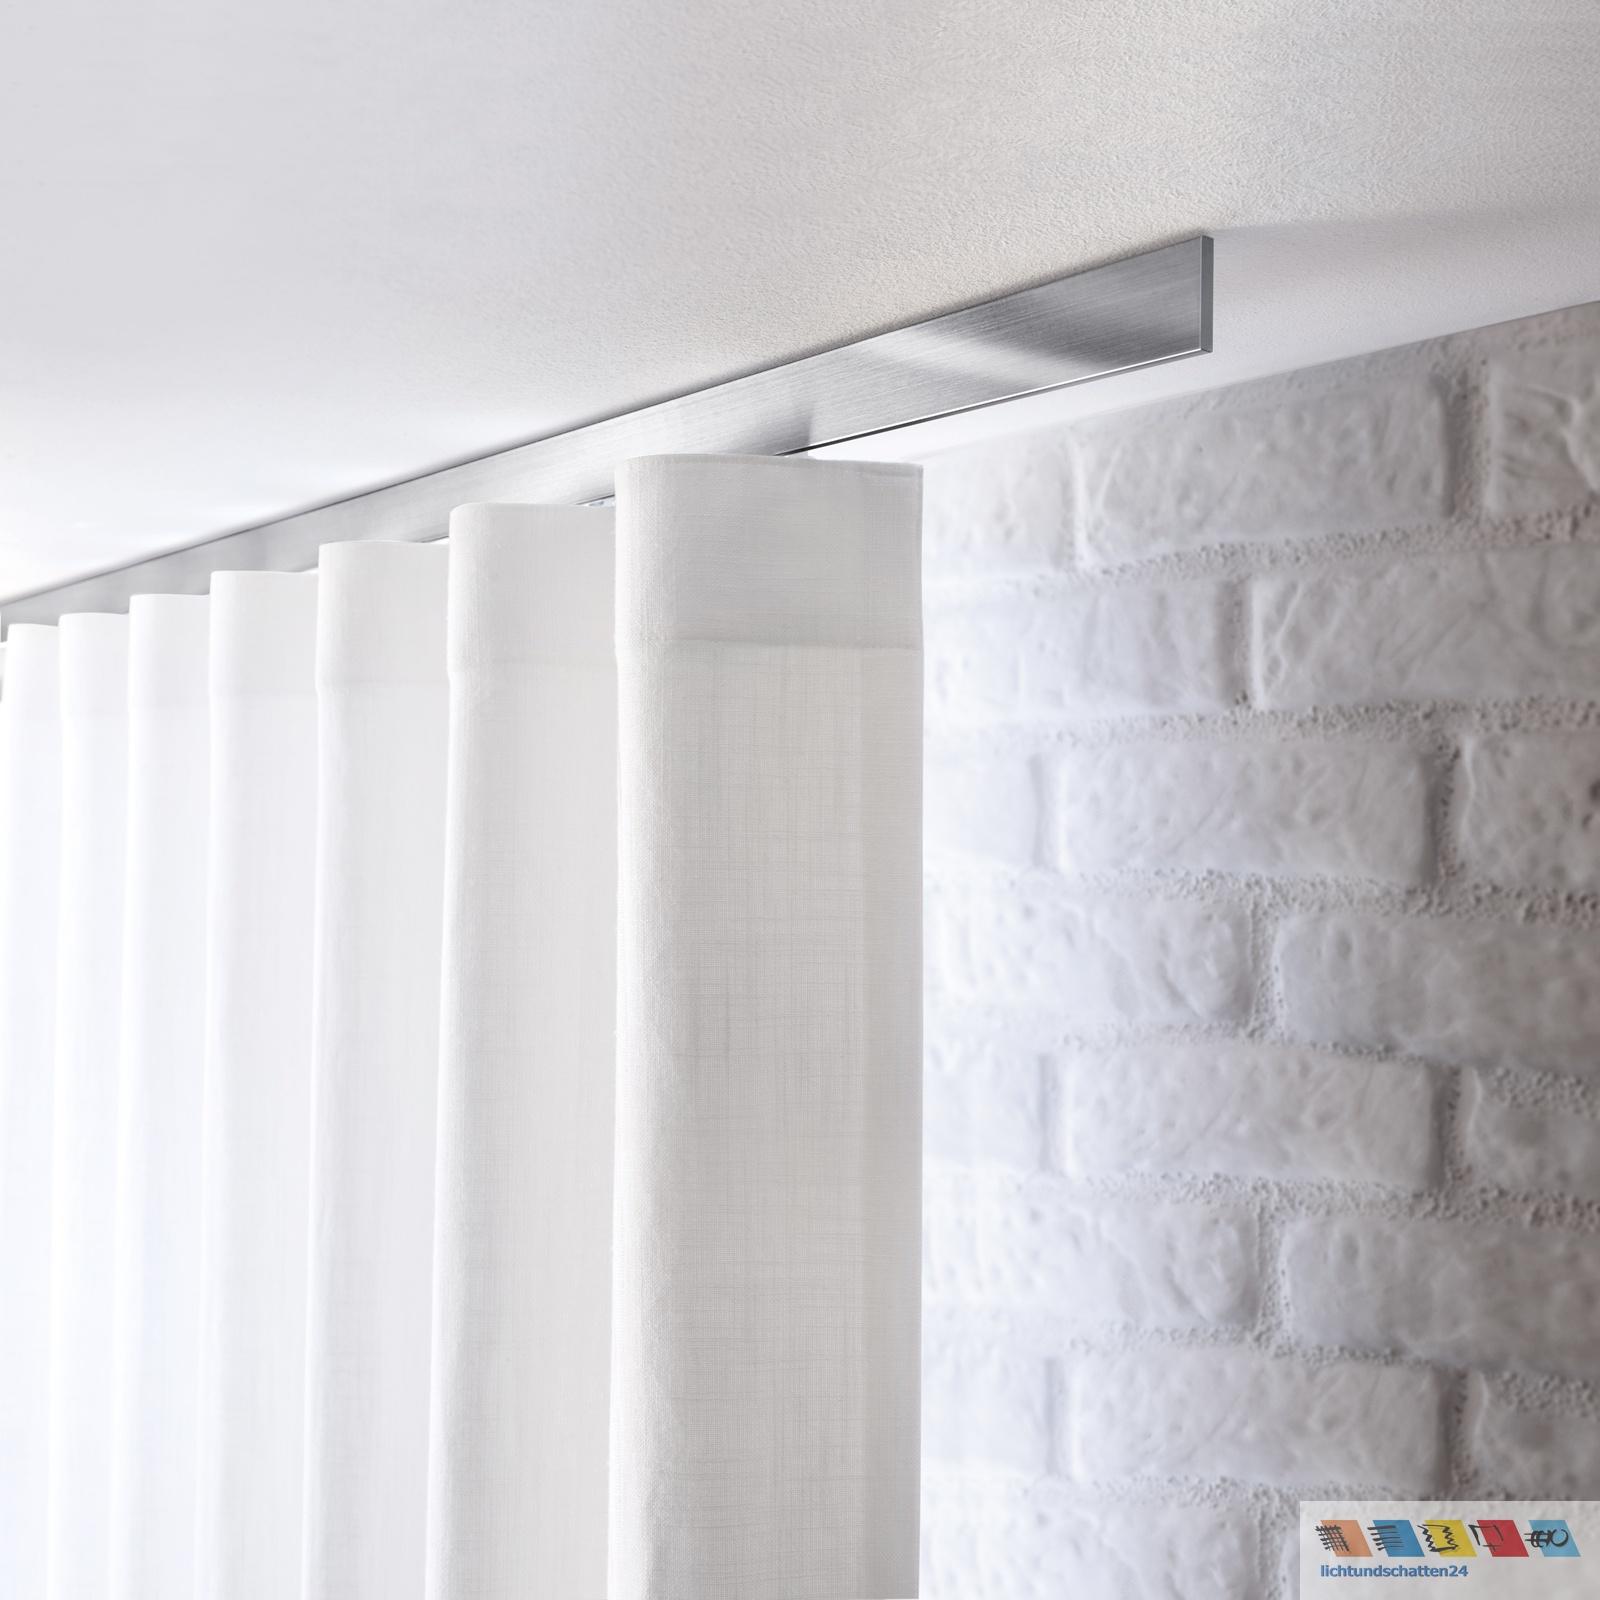 interstil flachprofil vorhangstange aluminium. Black Bedroom Furniture Sets. Home Design Ideas